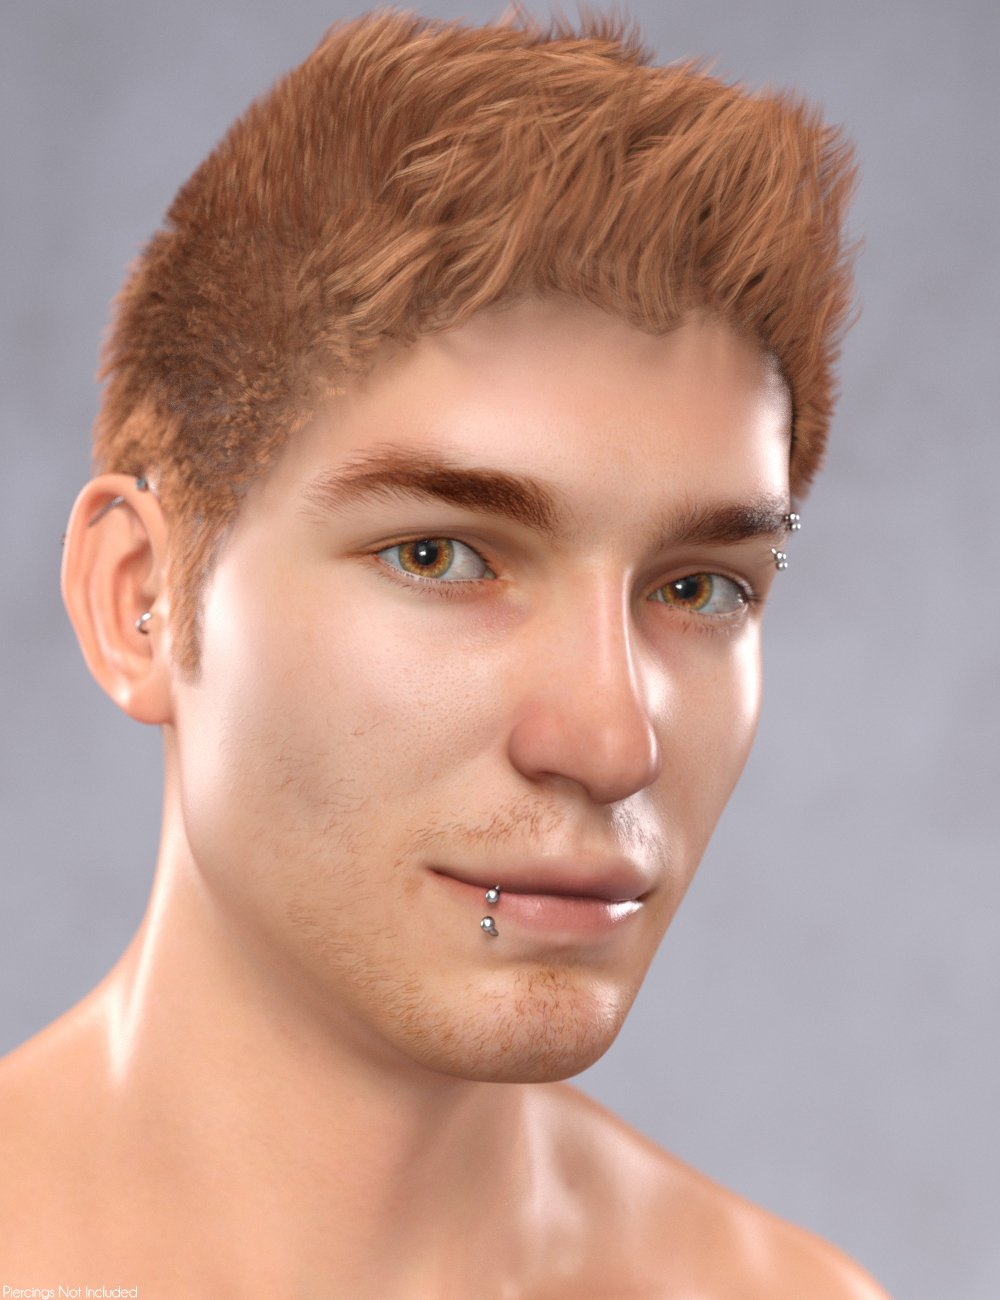 Chance for Owen 8 by: VincentXyooj, 3D Models by Daz 3D